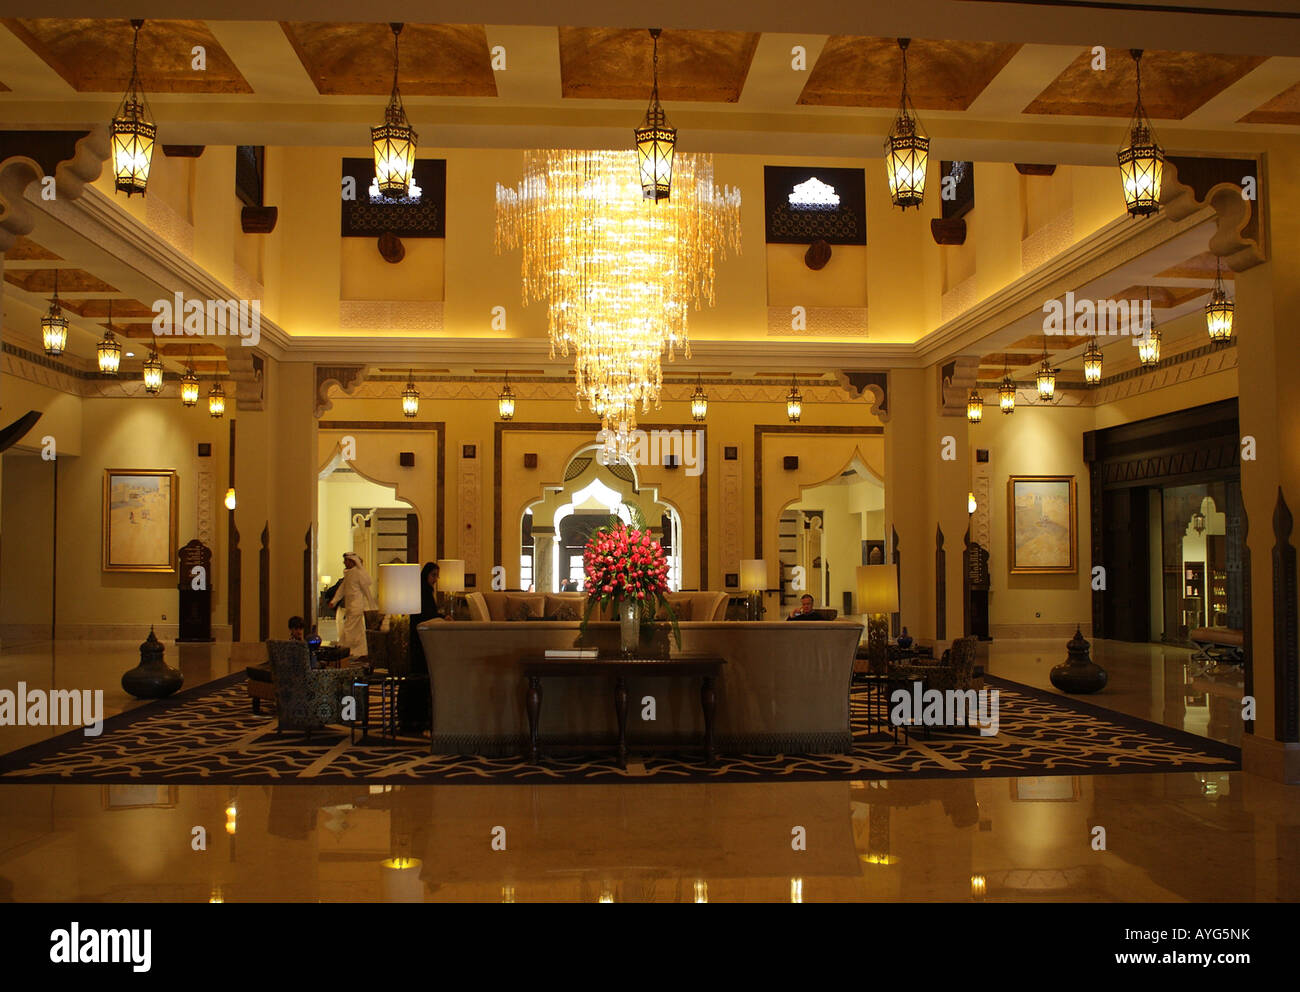 L'hôtel cinq étoiles de luxe Ritz Carlton Sharq Village and Spa à Doha, Qatar Photo Stock